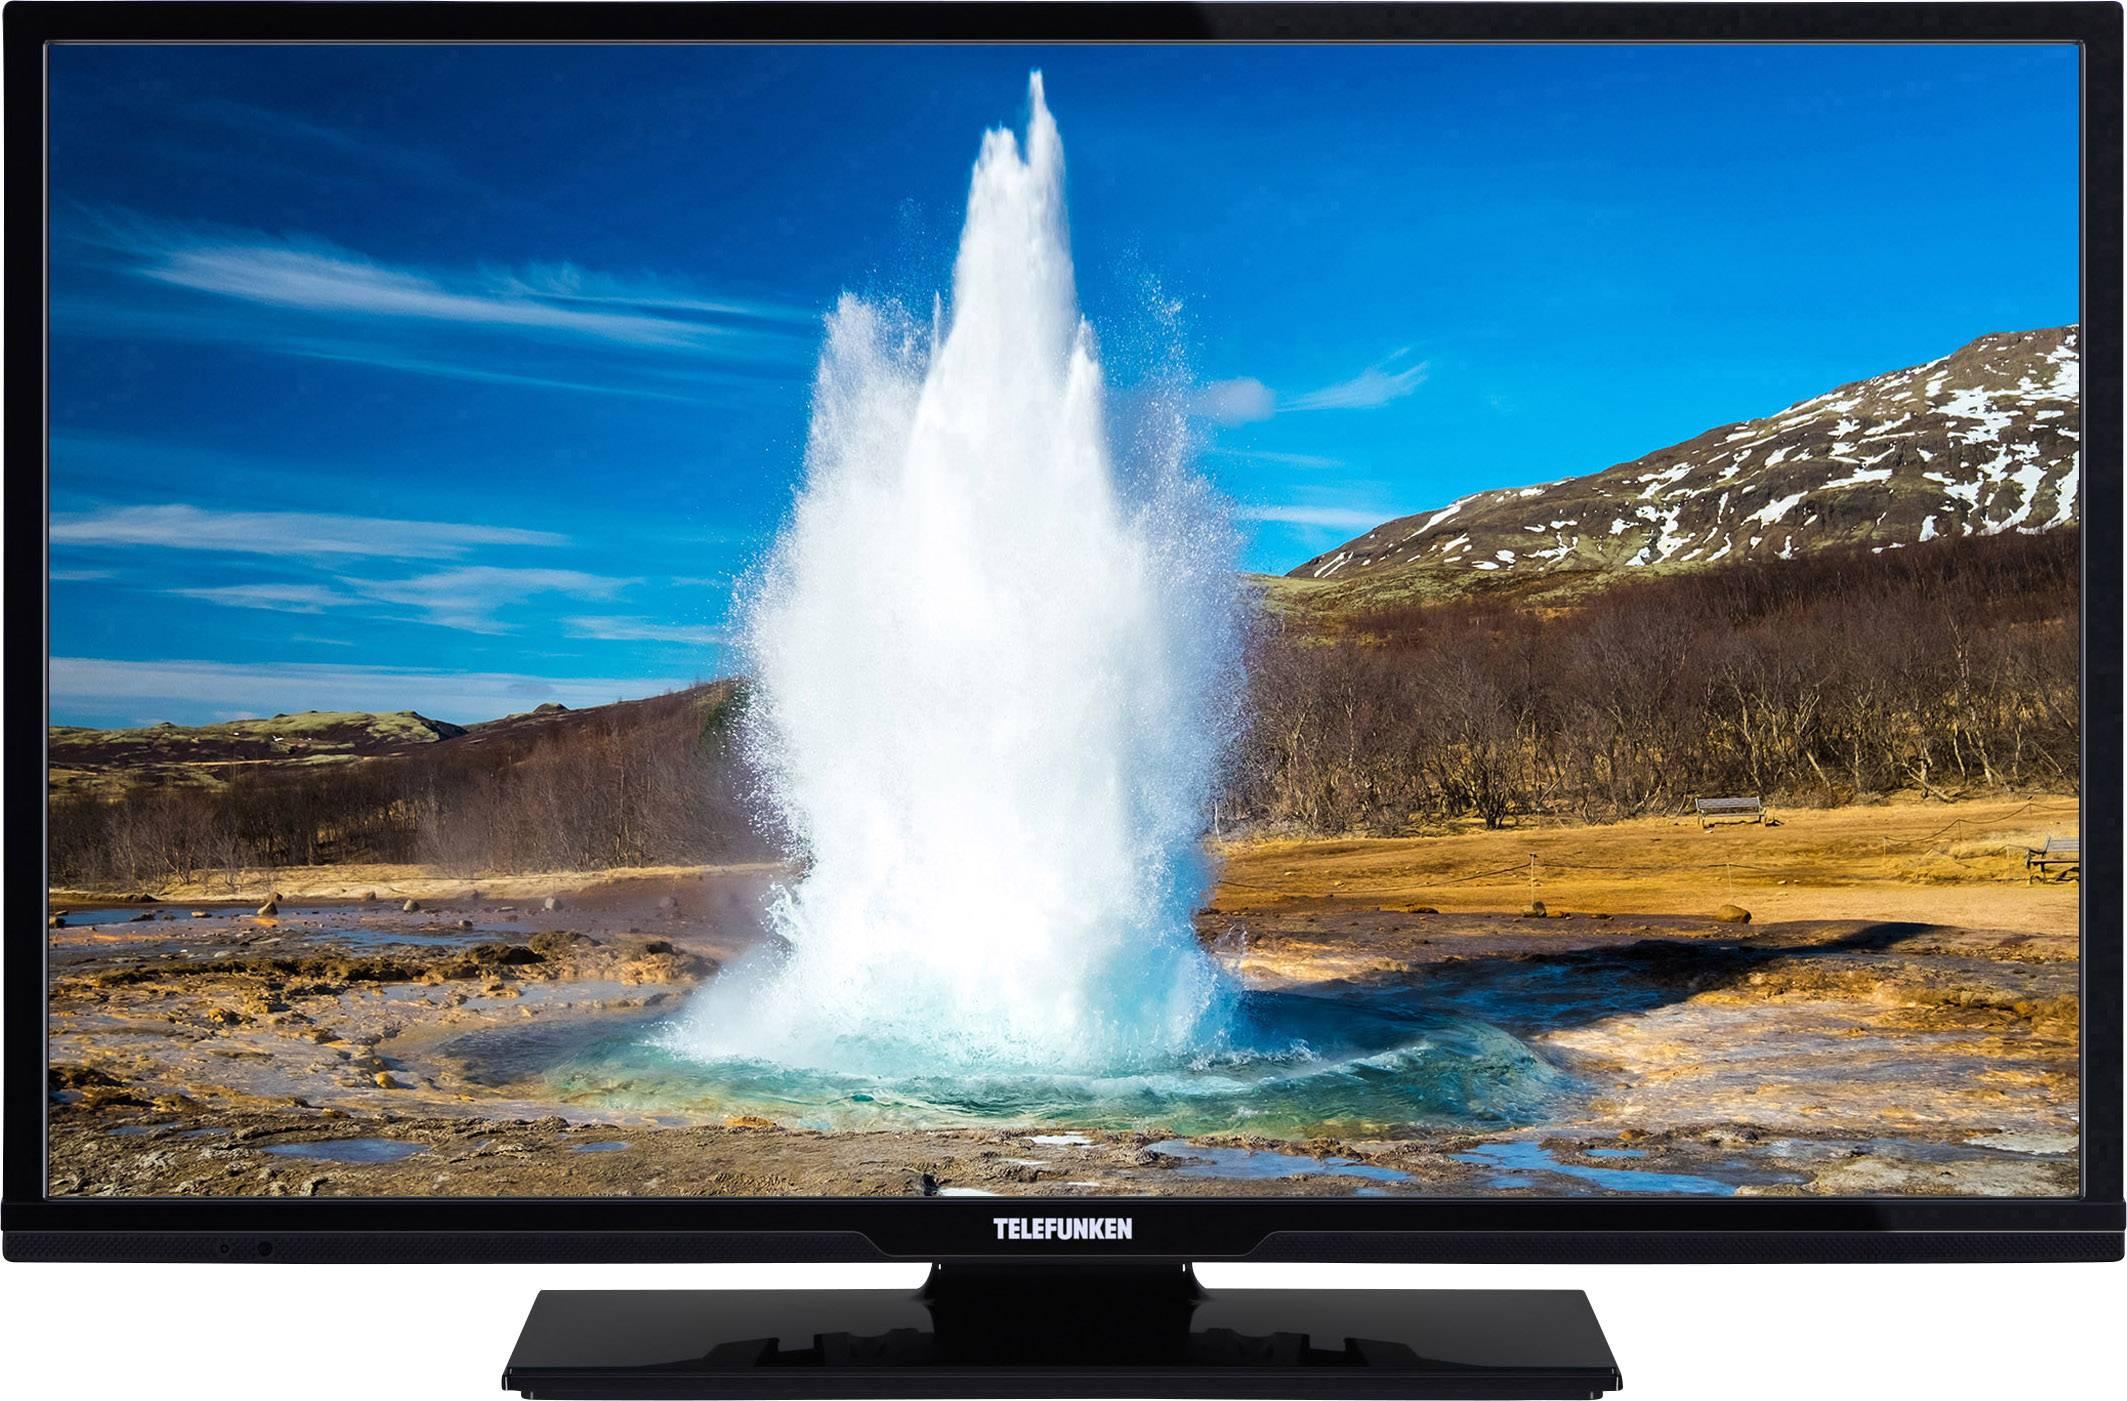 Kühlschrank Telefunken : Telefunken fernseher geht nicht mehr an kühlschrank modelle